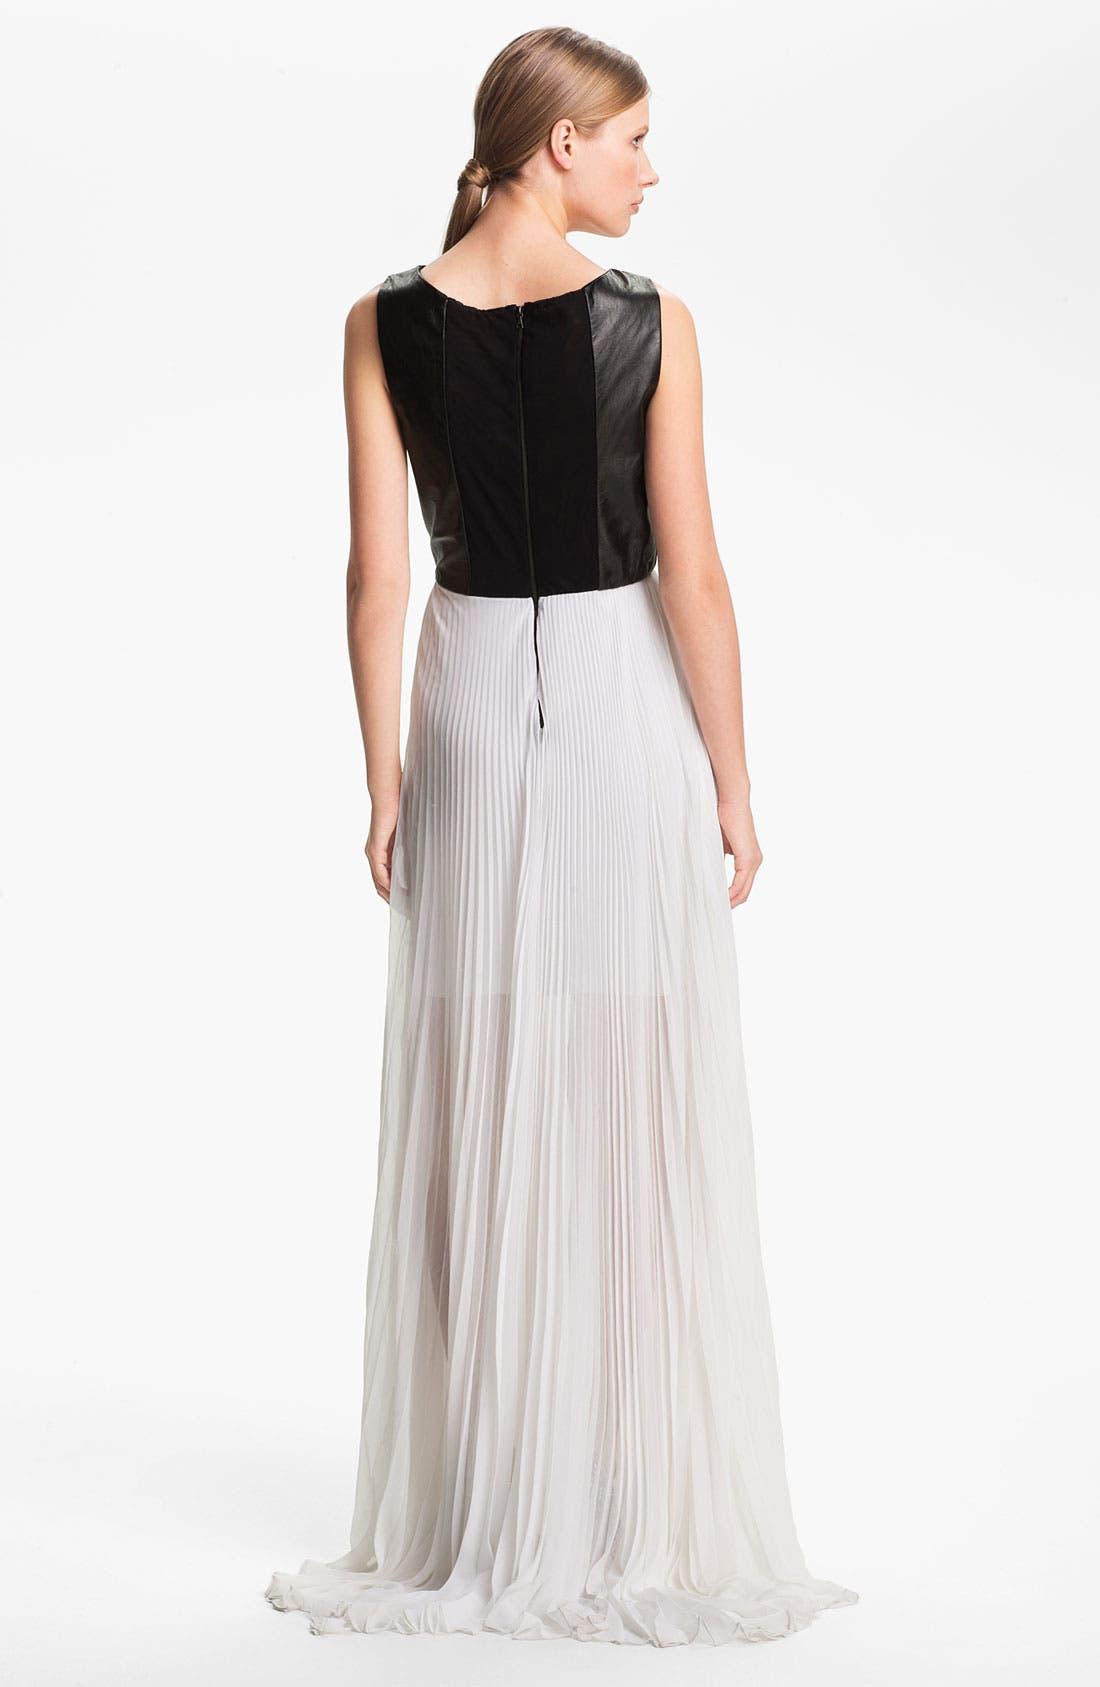 ALICE + OLIVIA,                             Leather Bodice & Chiffon Dress,                             Alternate thumbnail 3, color,                             009